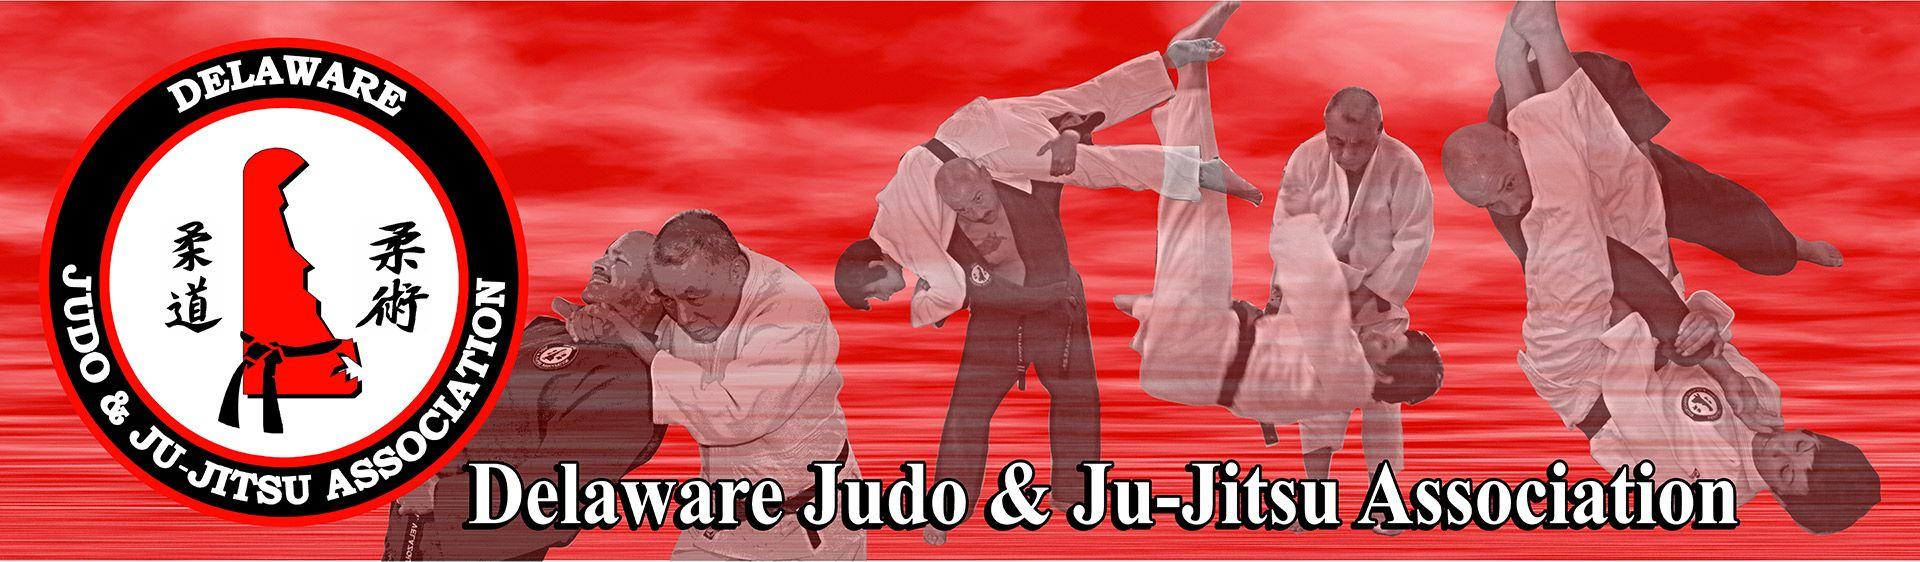 Delaware Judo & Ju-Jitsu Association